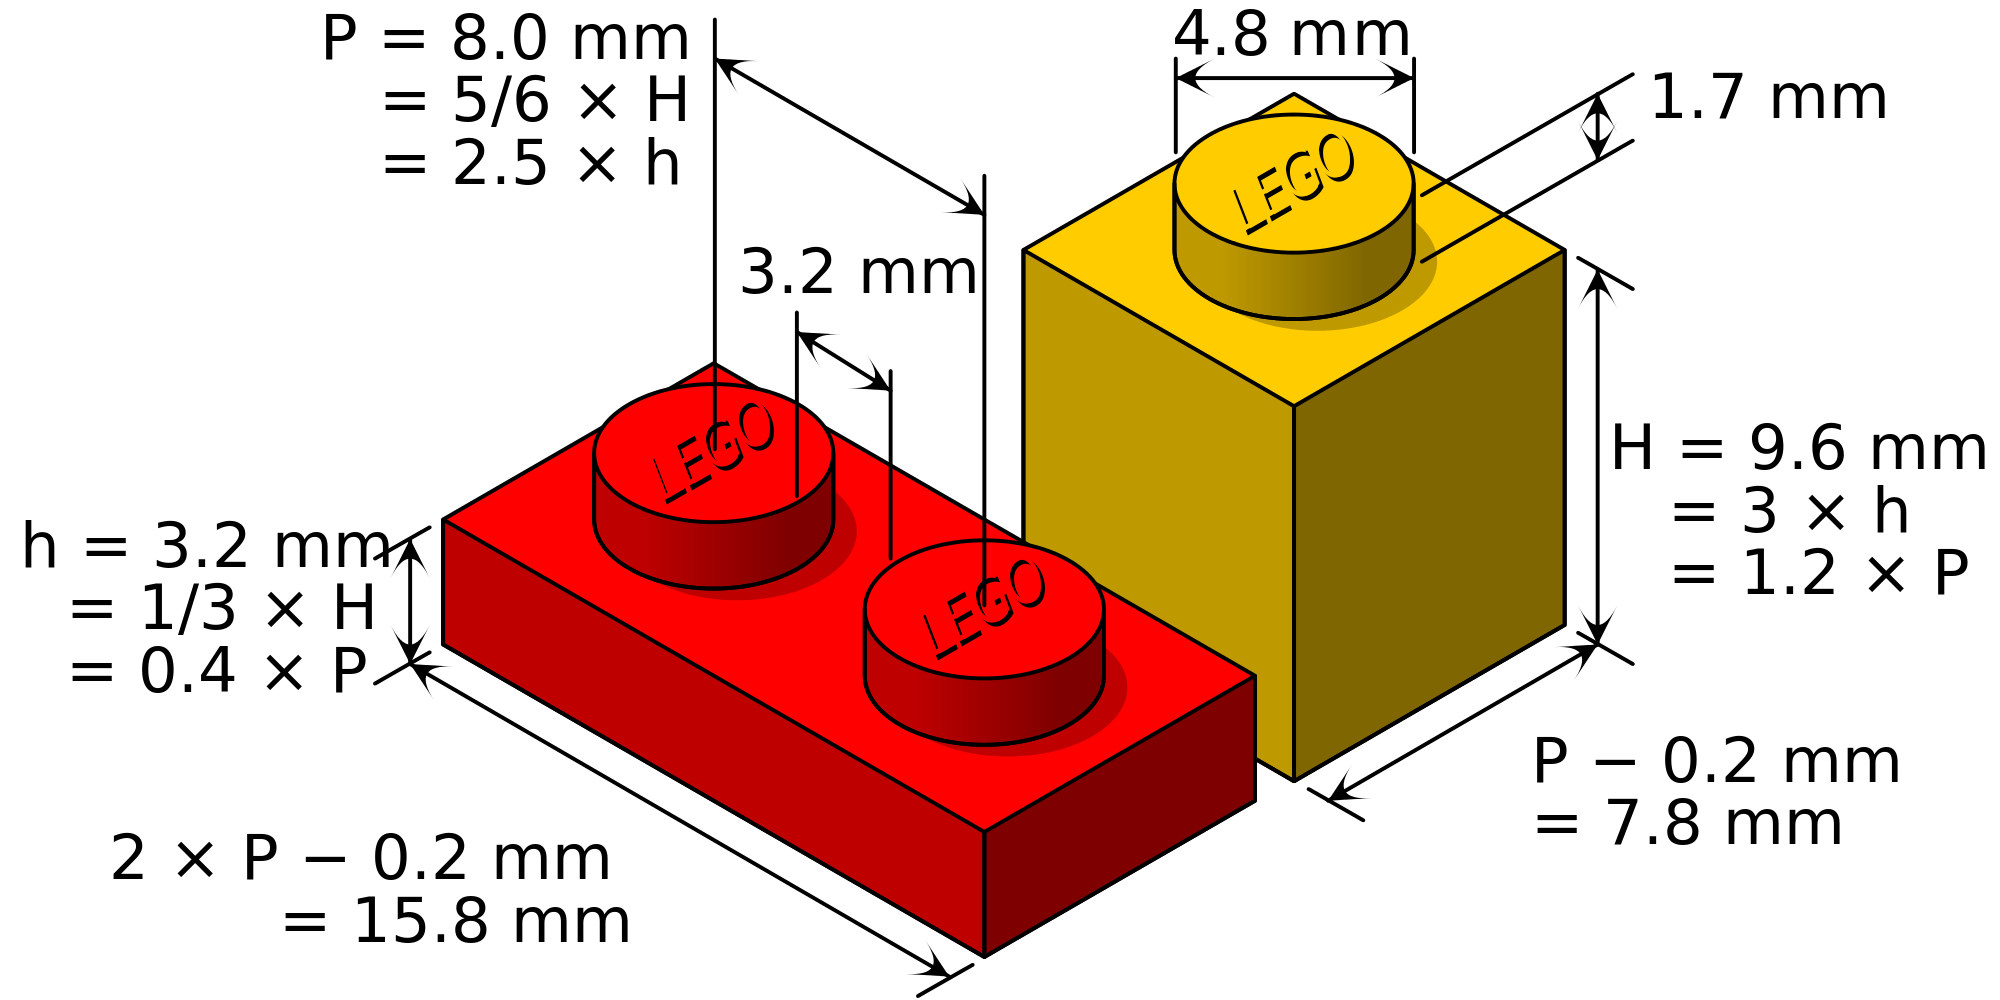 Lego clipart duplo block. Brick drawing at getdrawings